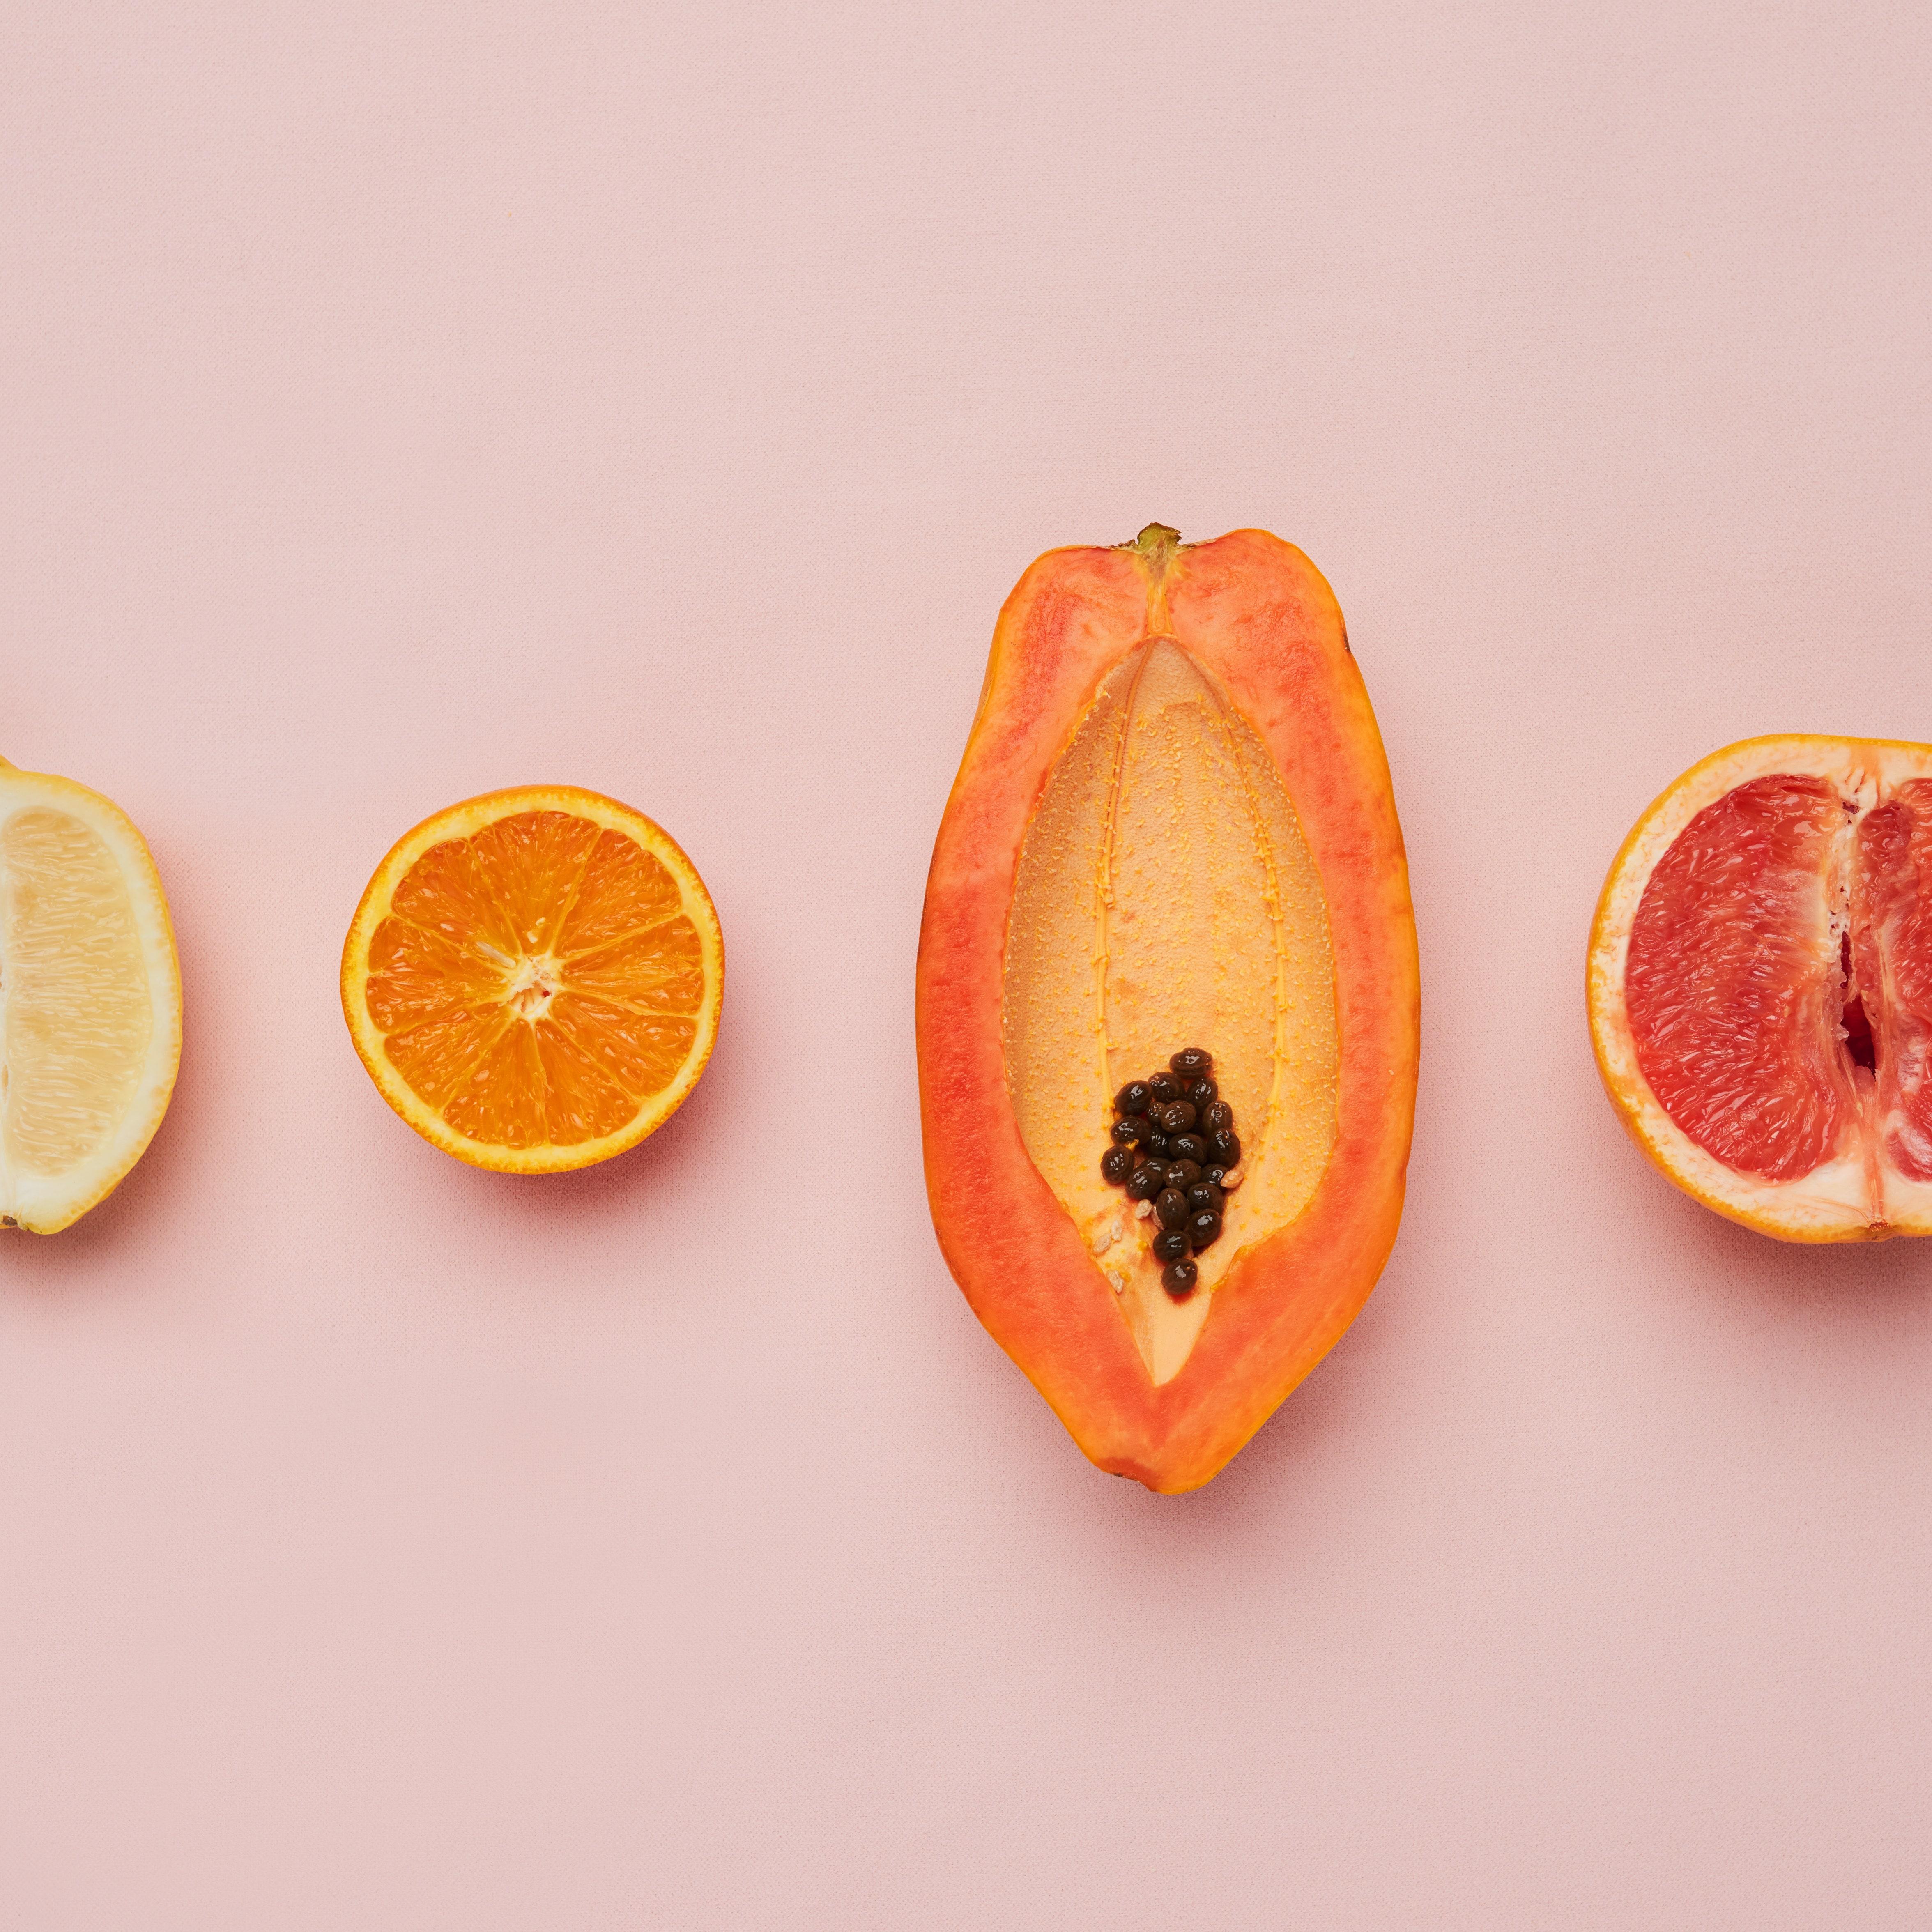 hpv szemolcs grapefruit